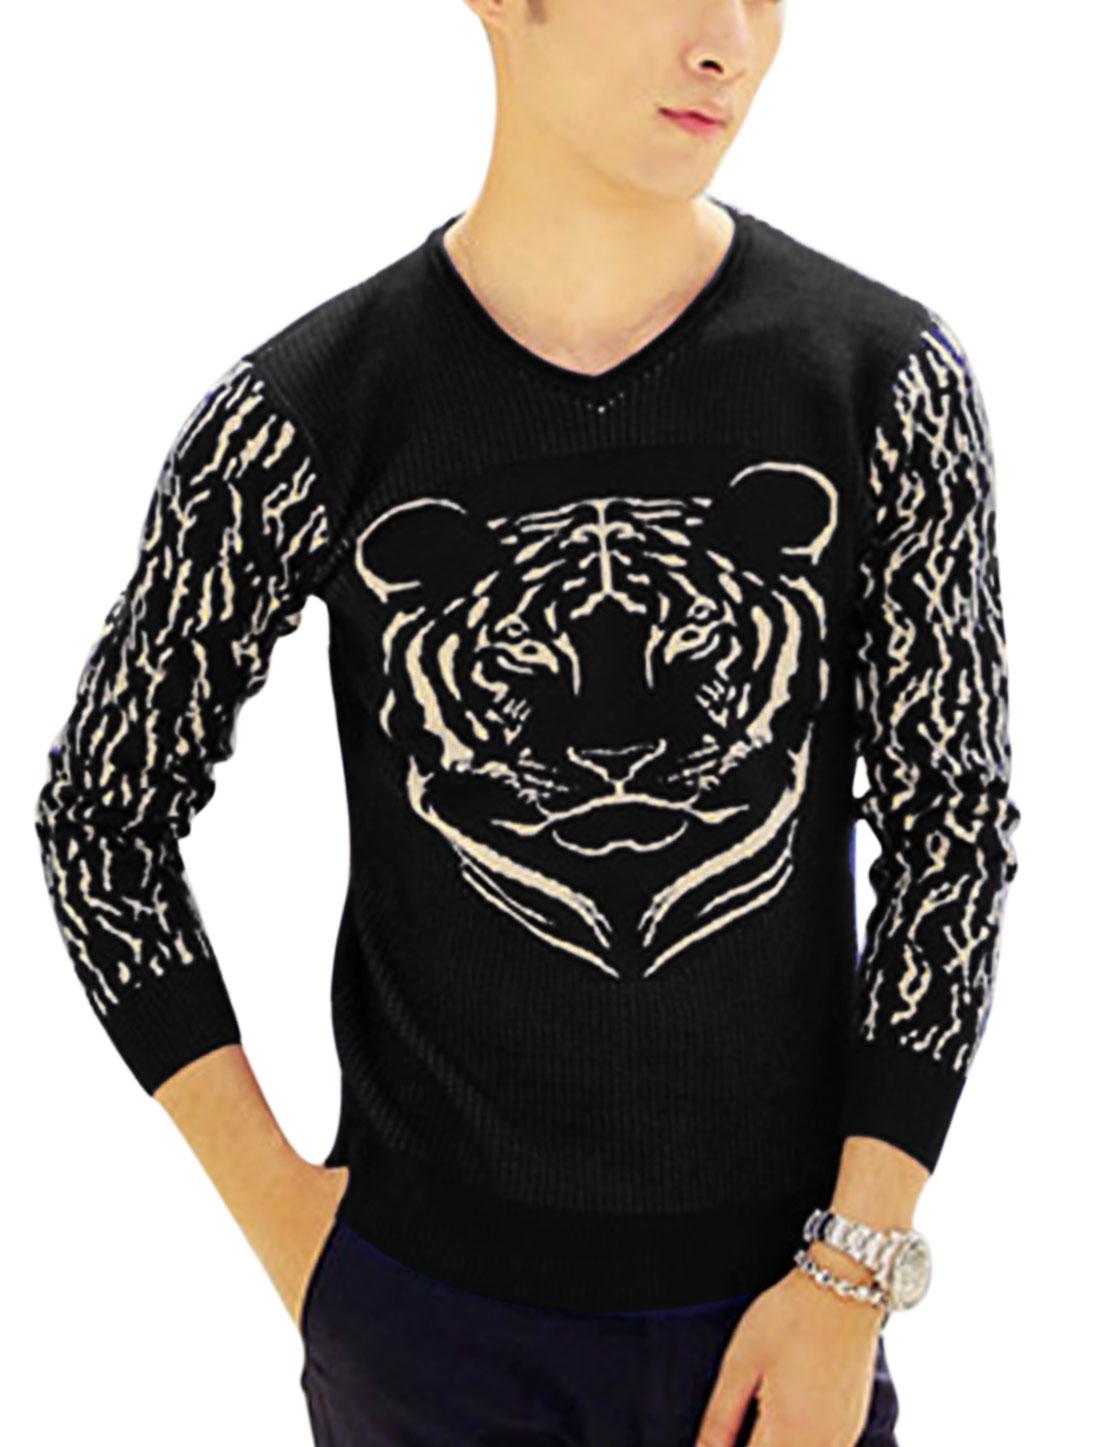 Man Black Long Sleeves V Neck Slipover Slim Fit Tiger Pattern Knit Shirt S